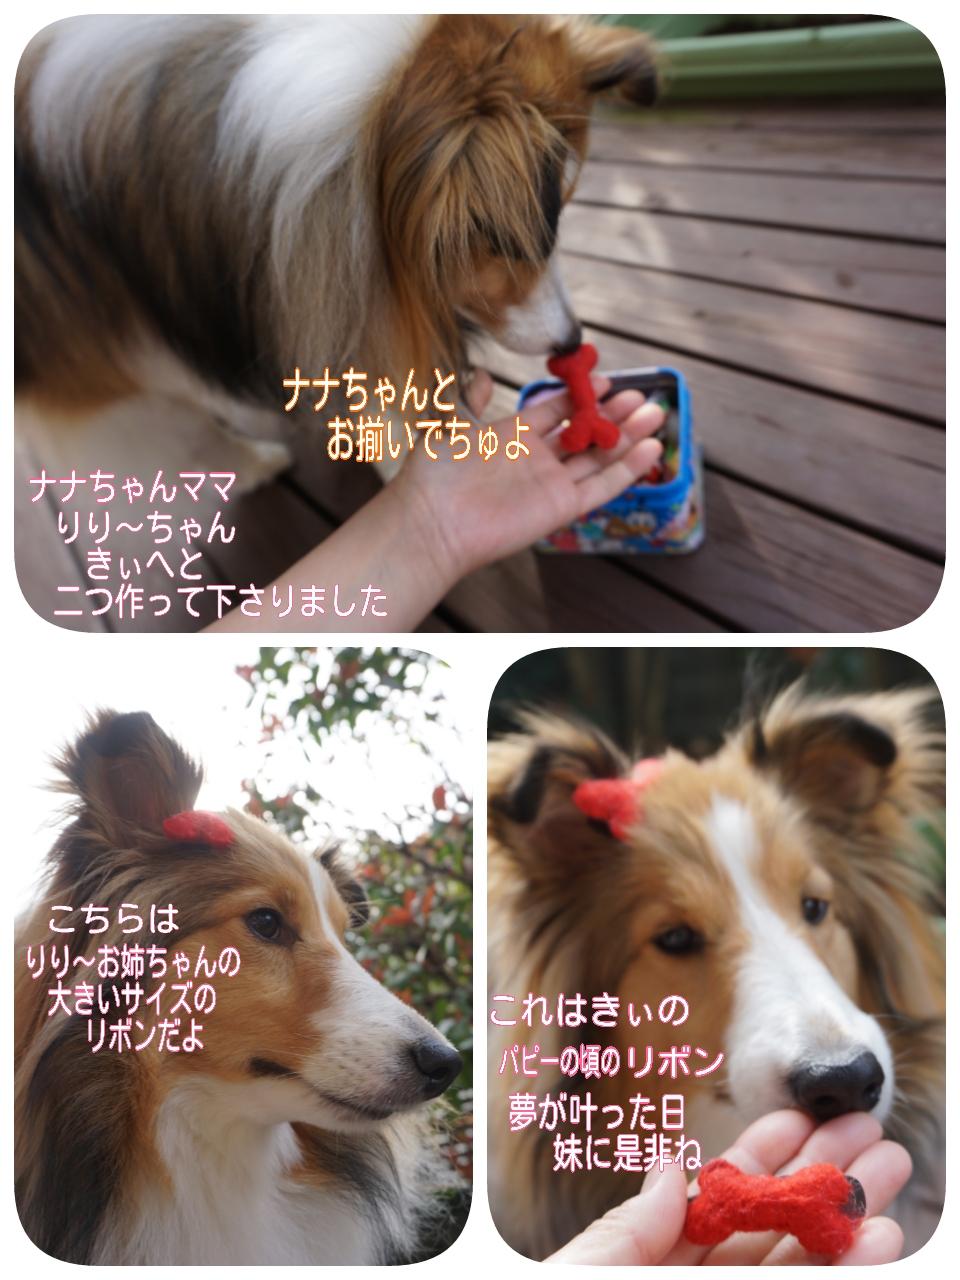 2015-04-09-11-55-26_deco.jpg